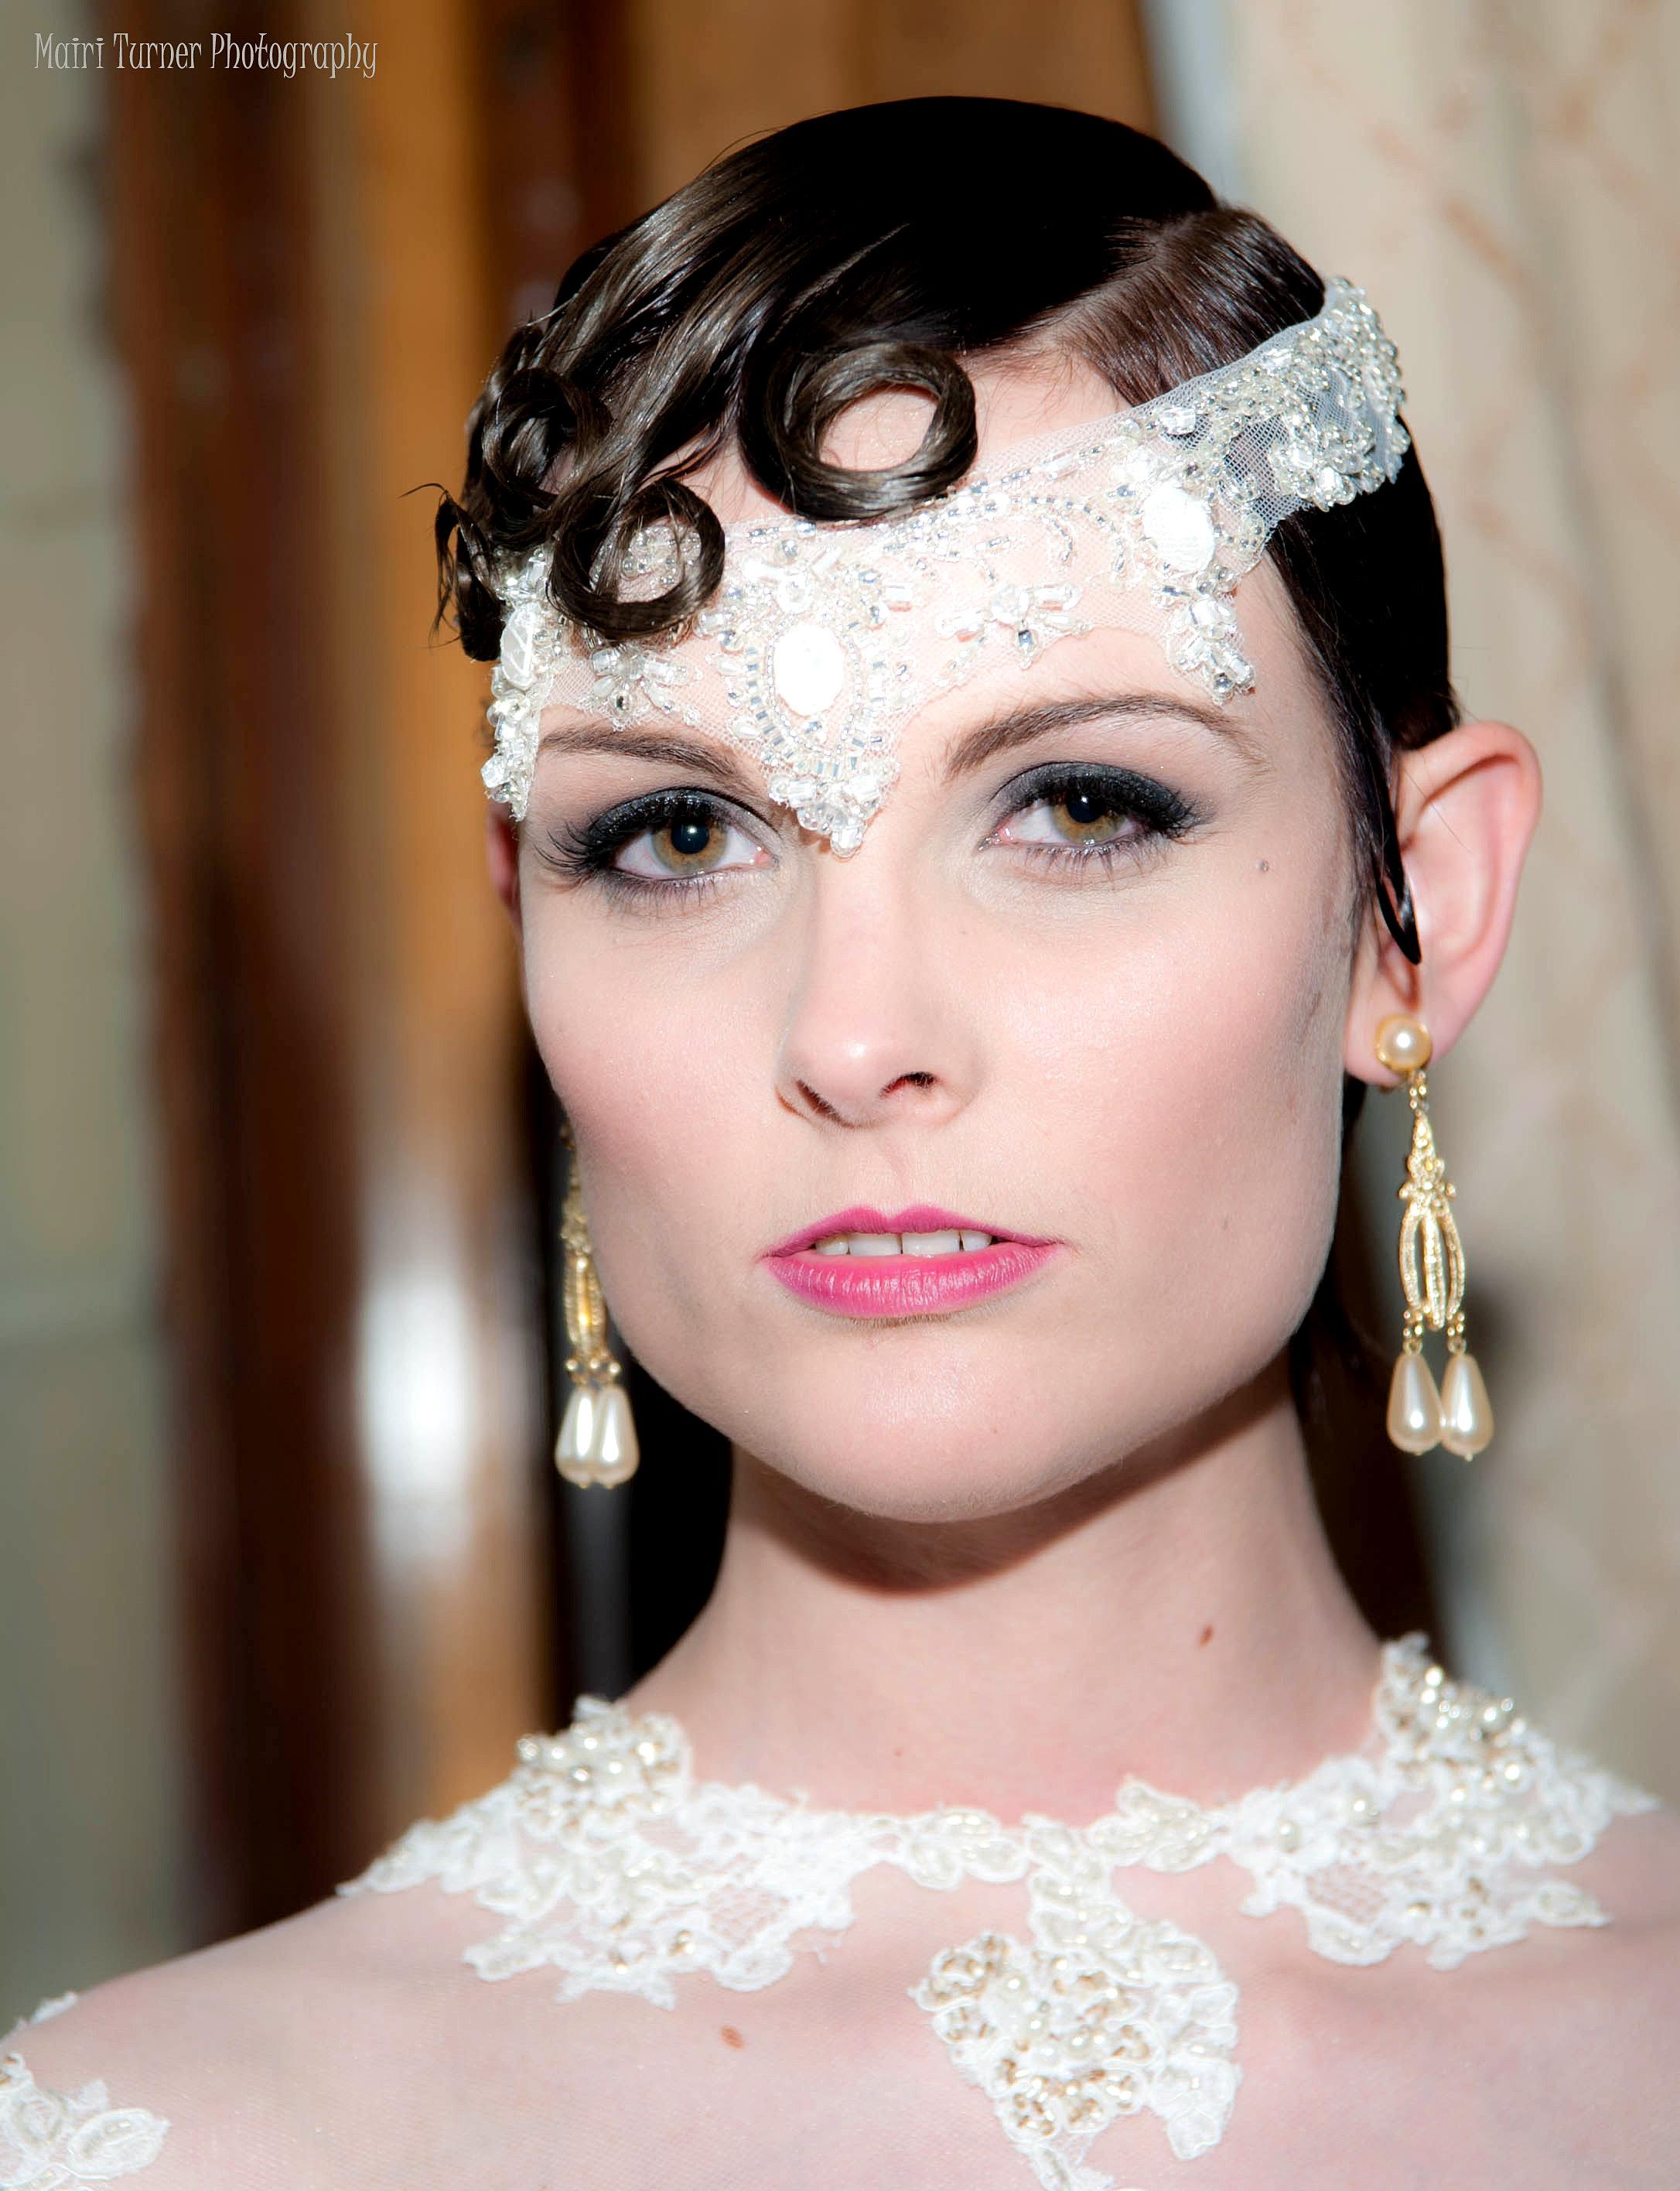 Vintage Wedding Makeup Artist : Mobile Makeup Artist in Shrewsbury, Shropshire, Wedding ...